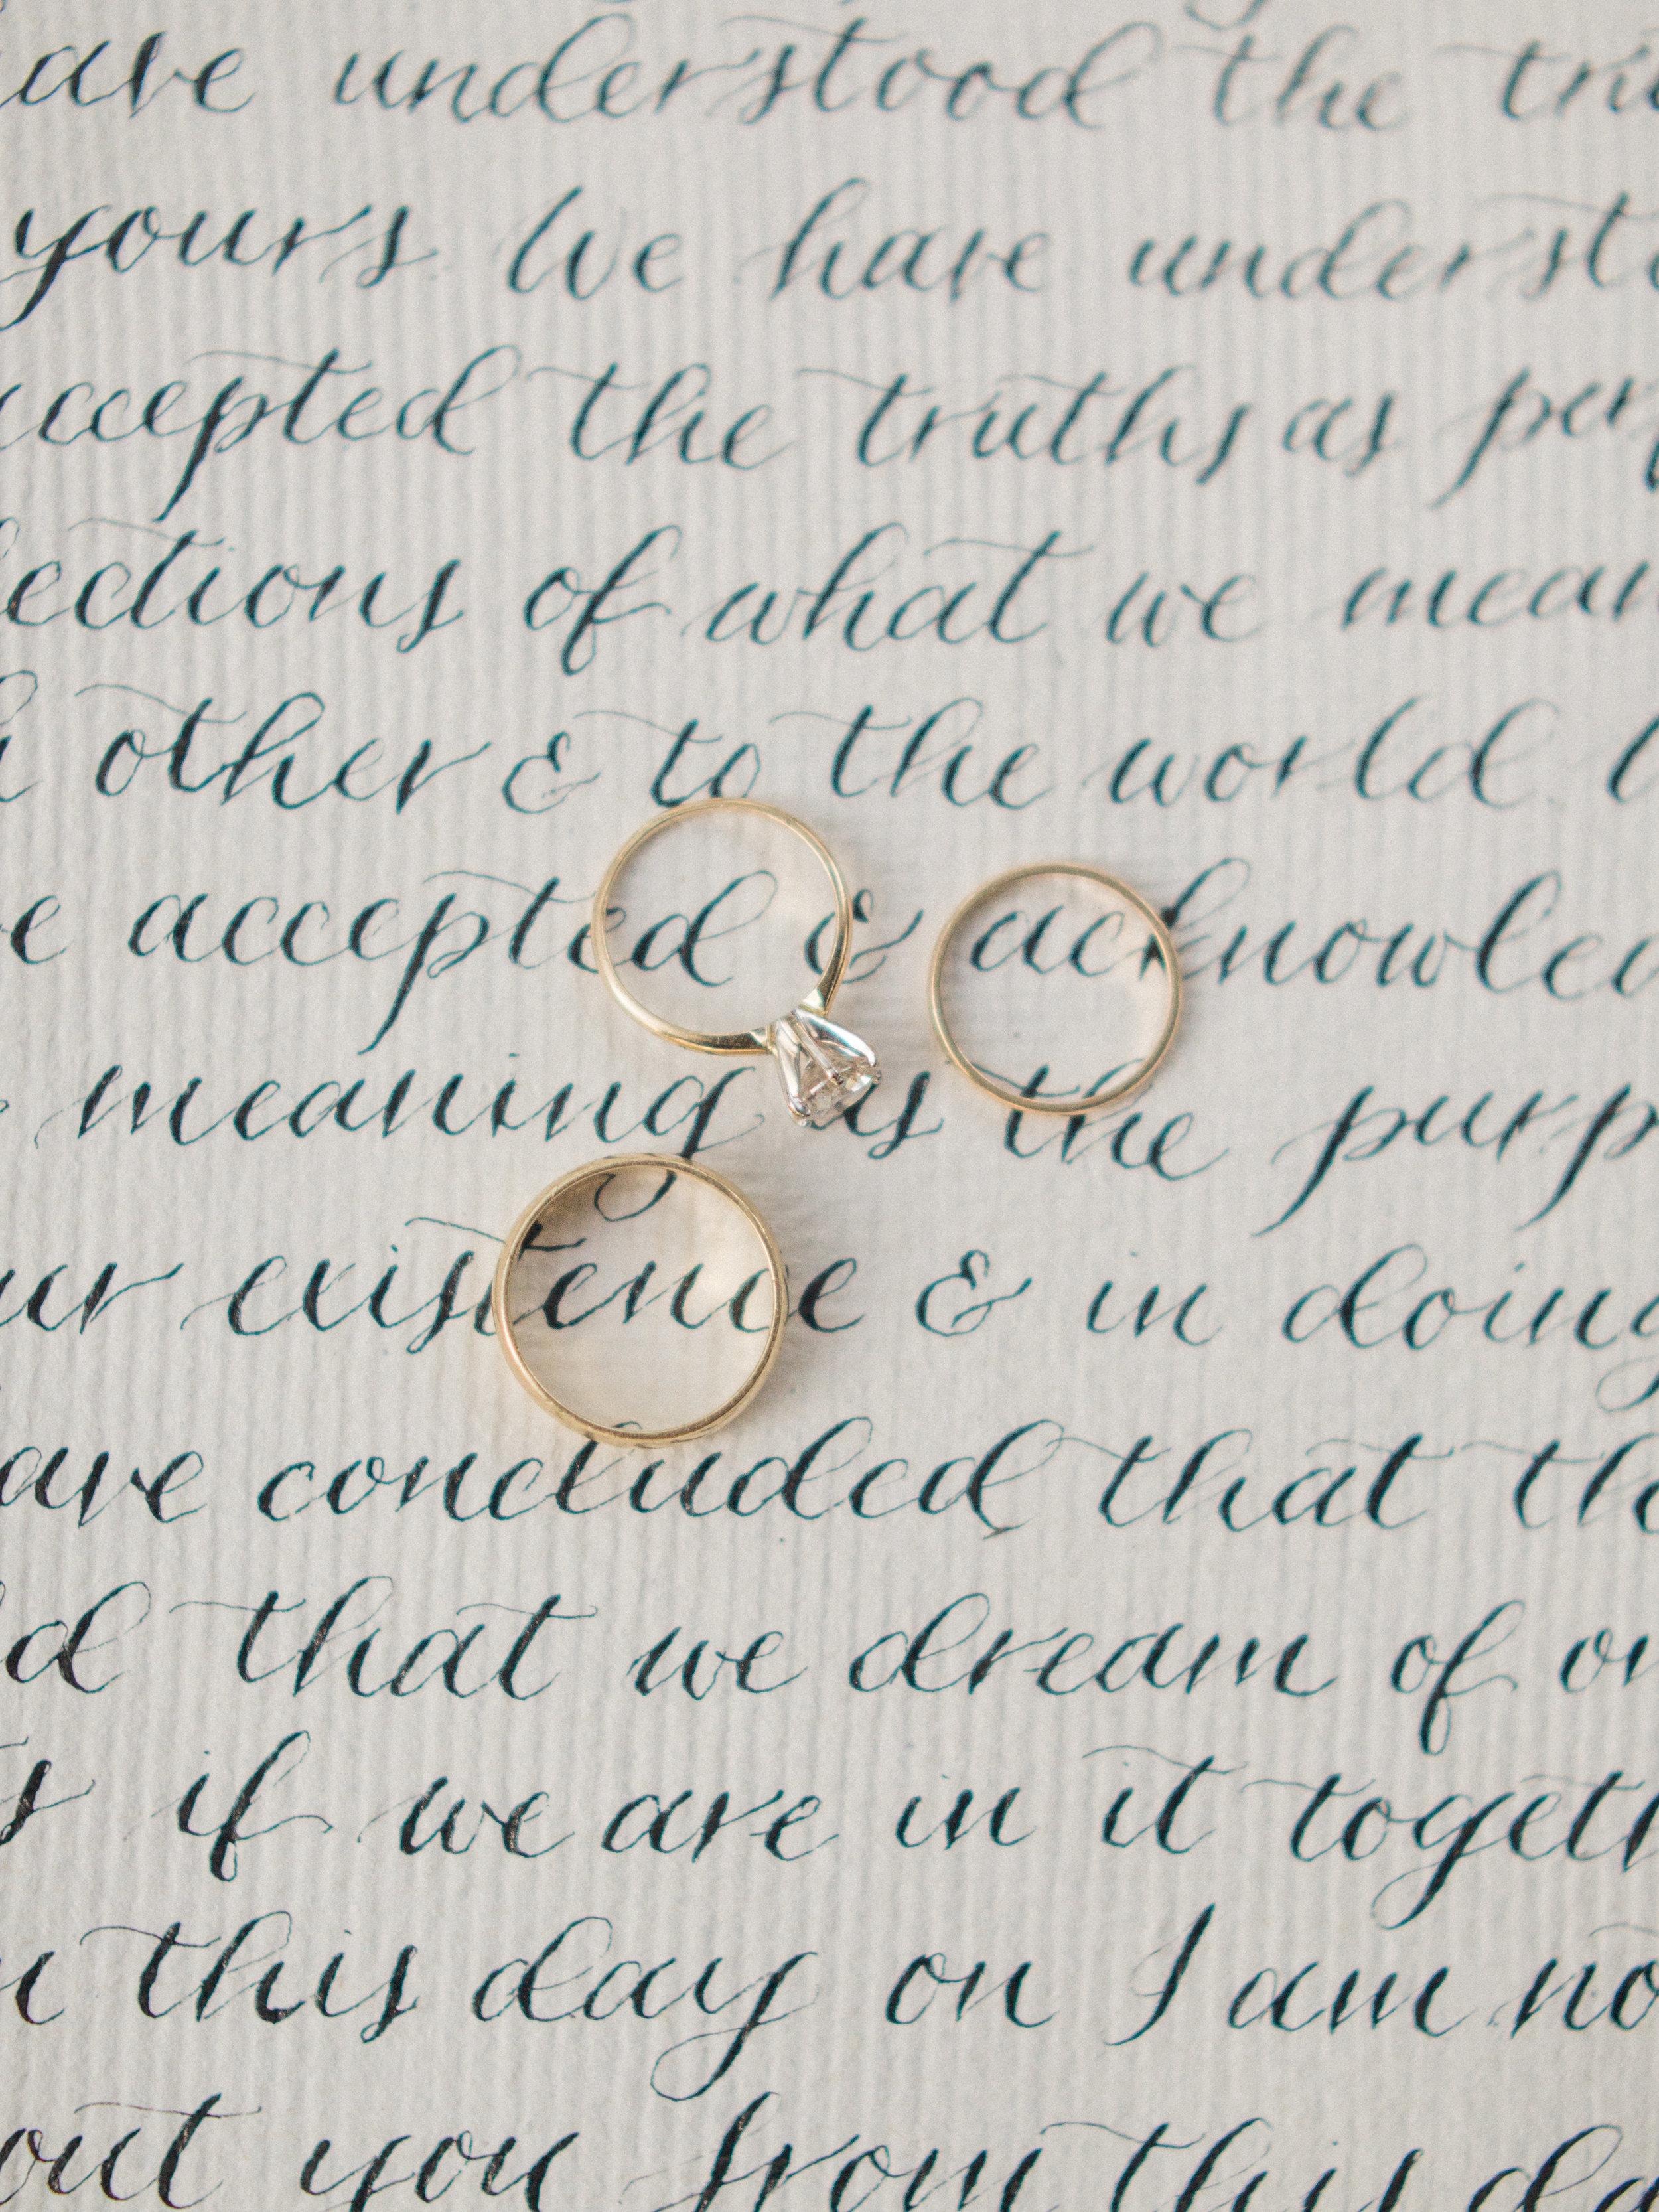 Calligraphy: Spurlé Gul Studio | Photography: Simply Sarah Photography